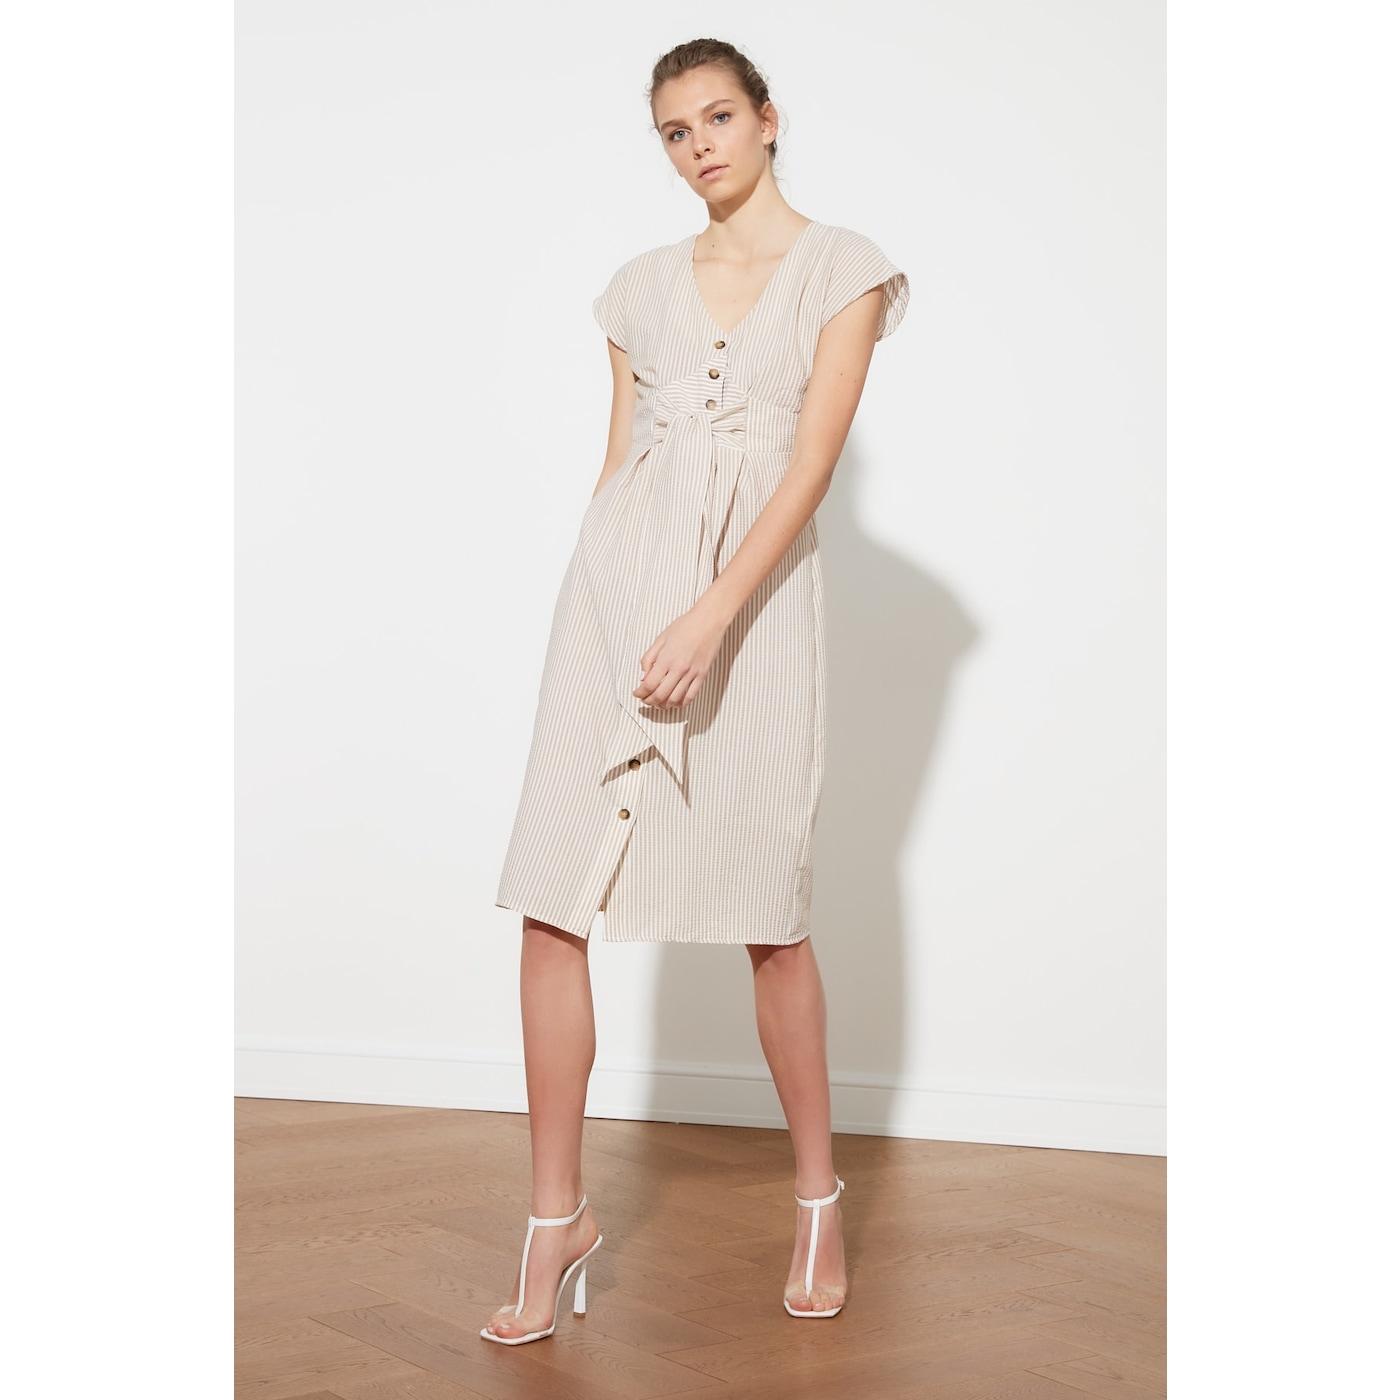 Trendyol Striped Dress with White Tie DetailING dámské 40